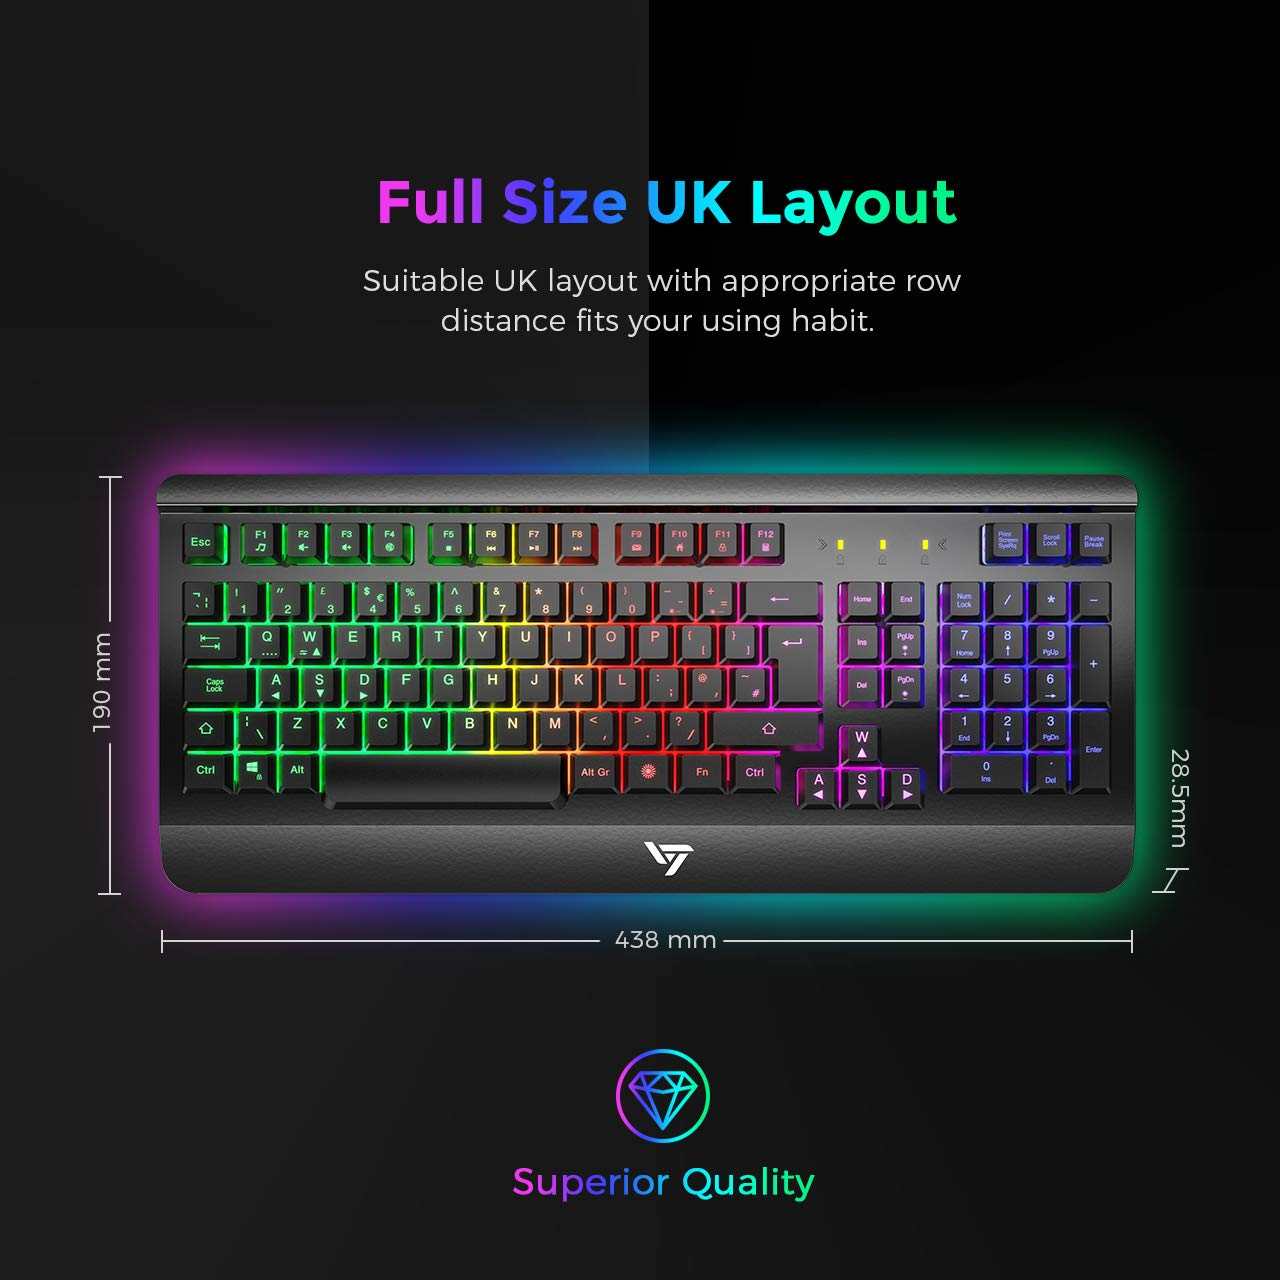 Gaming Keyboard UK, VicTsing Ultra-Slim All-Metal Frame USB Wired Keyboard  with Comfortable Wrist Rest, Rainbow LED, 12 Multimedia Shortcut Keys,